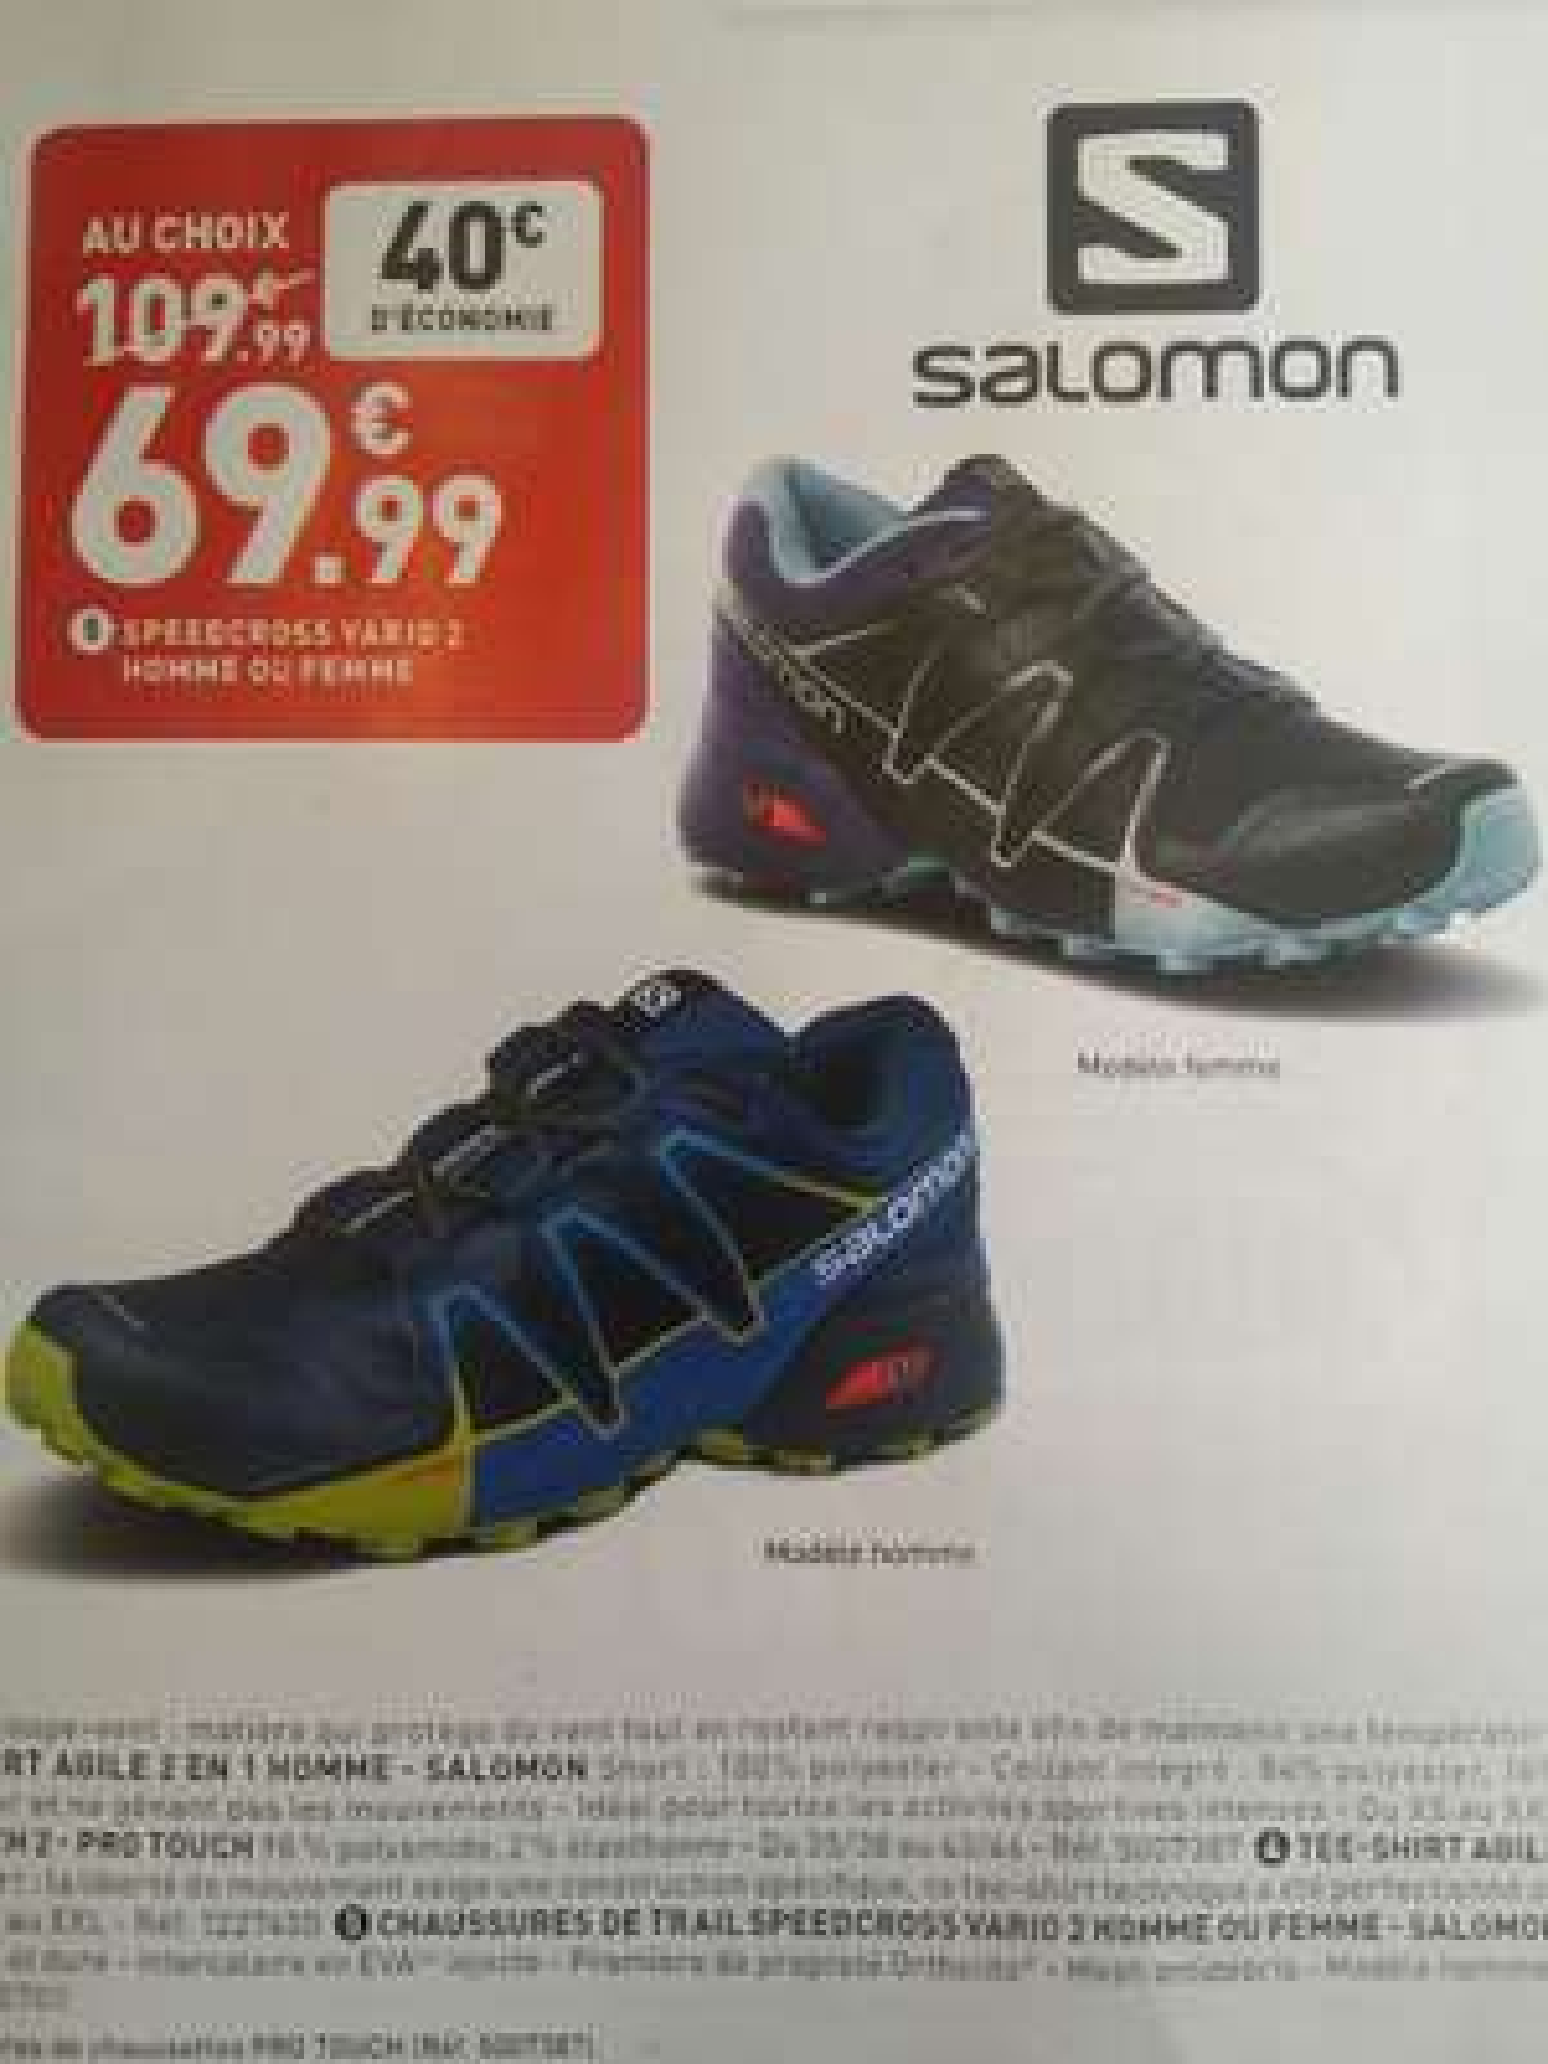 Chaussures de Trail Salomon Speedcross Vario 2 (homme ou femme) - Auray (56)